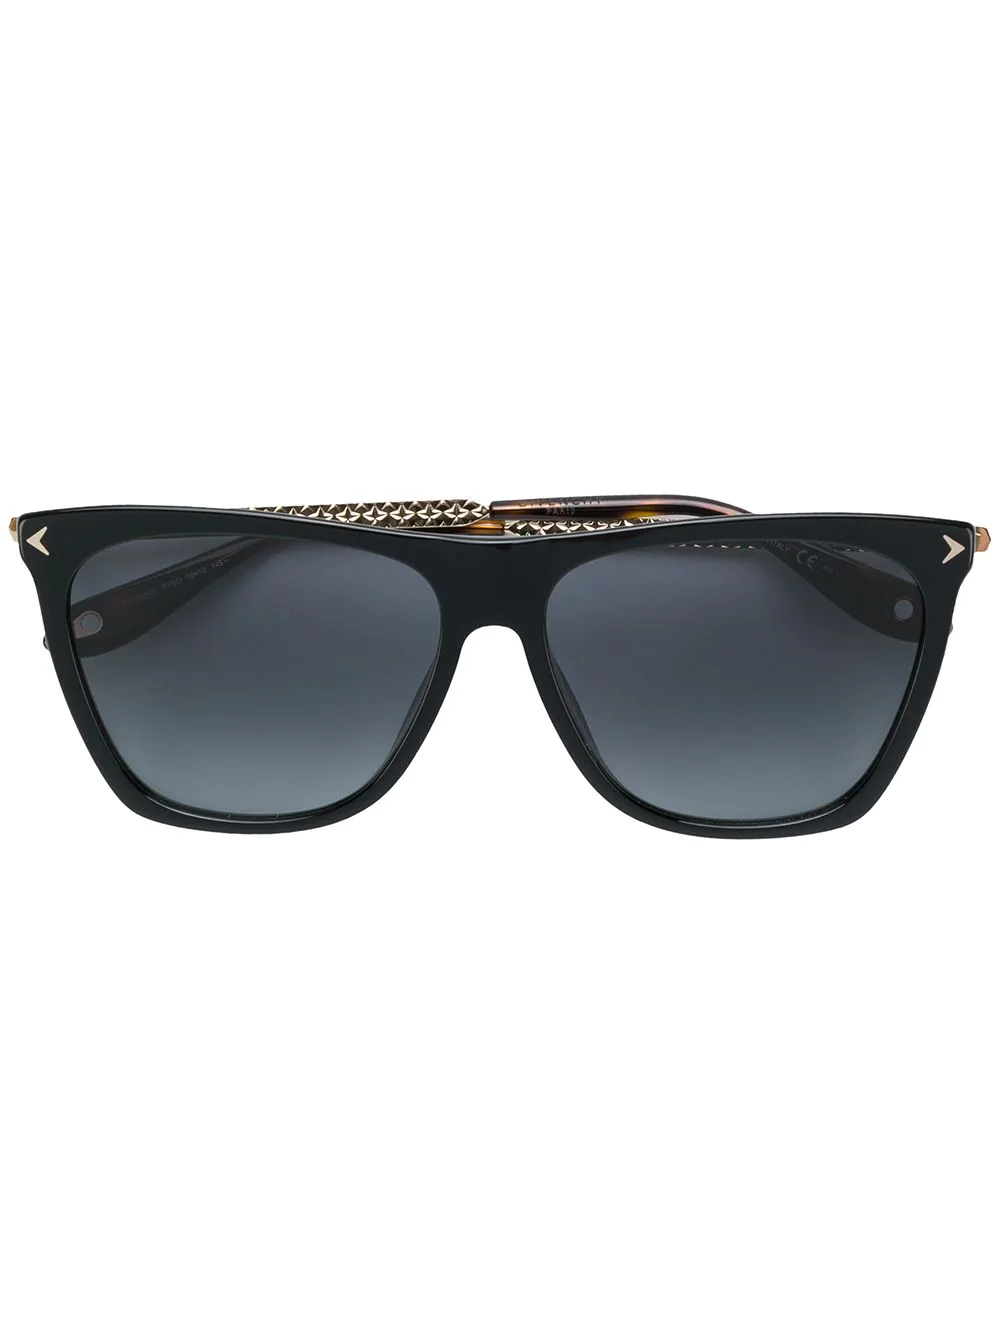 GIVENCHY | солнцезащитные очки в квадратной оправе | Clouty